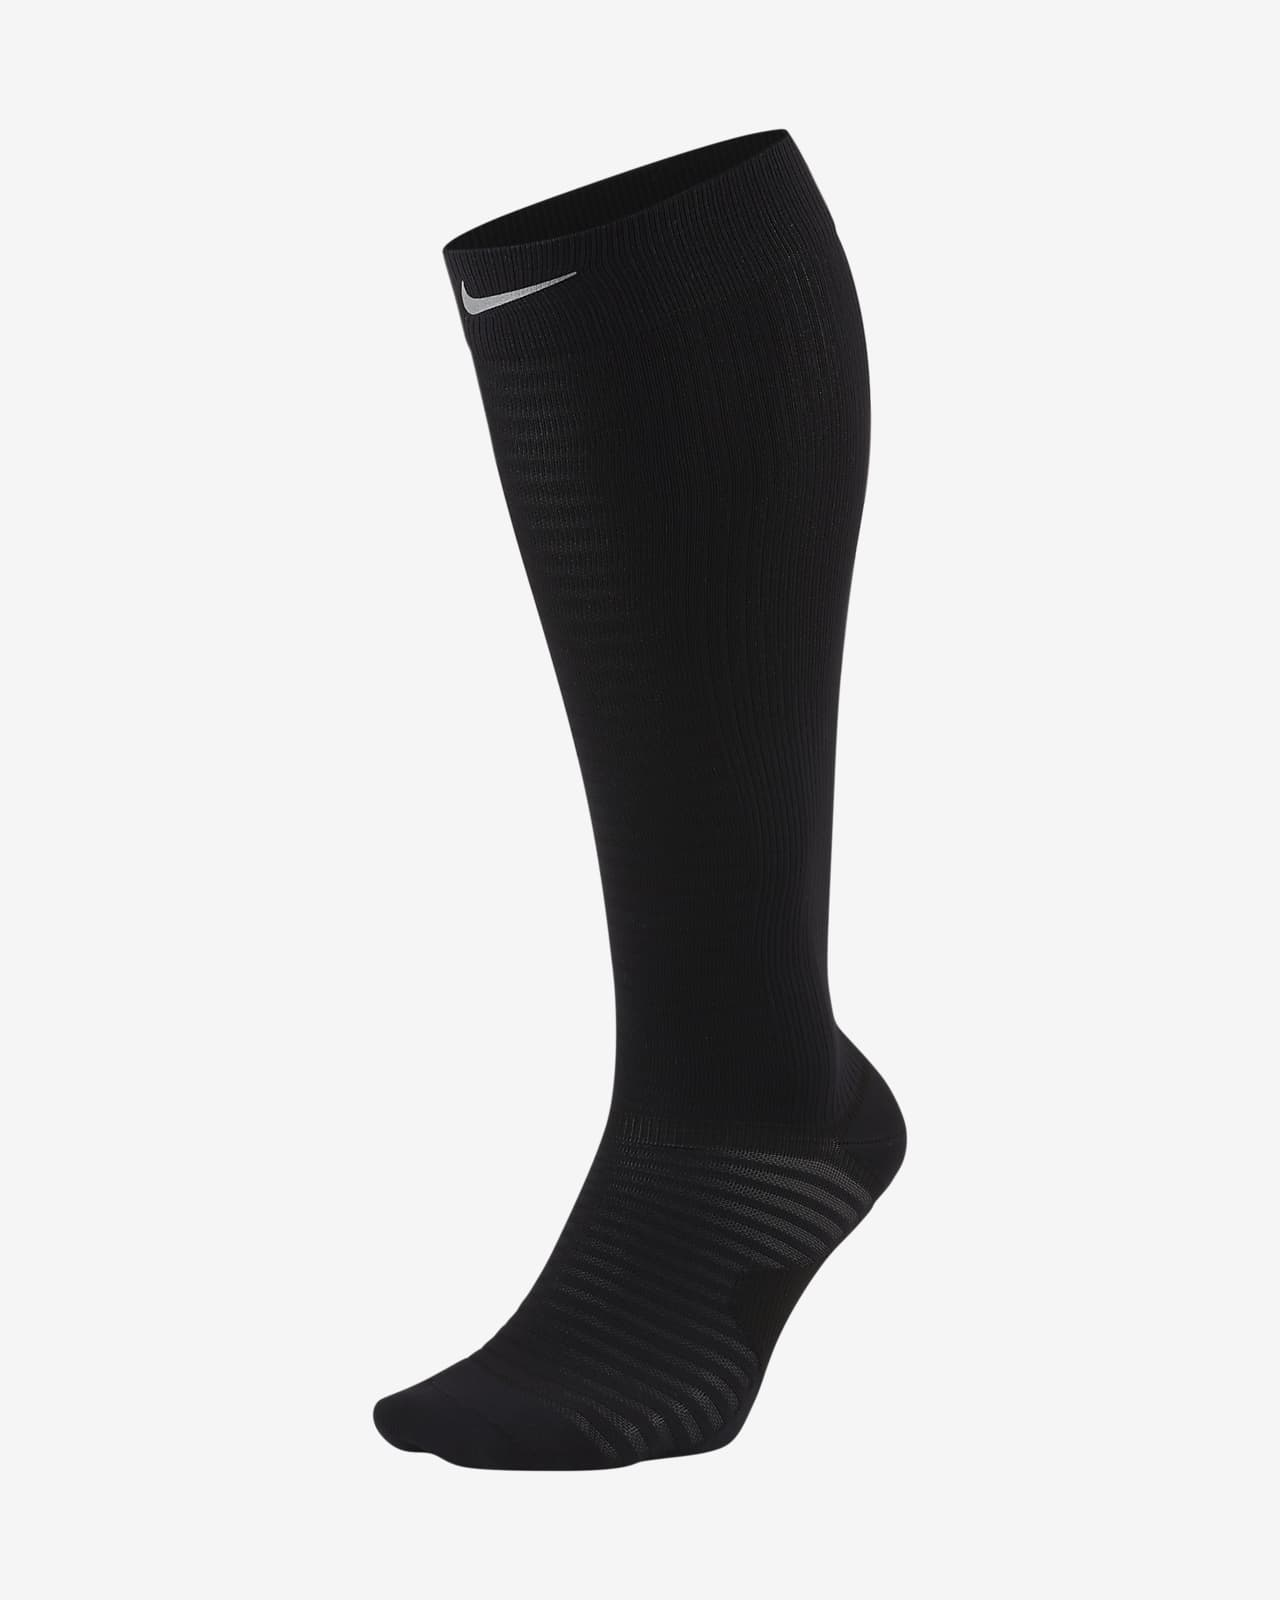 Calzettoni da running compression fit Nike Spark Lightweight